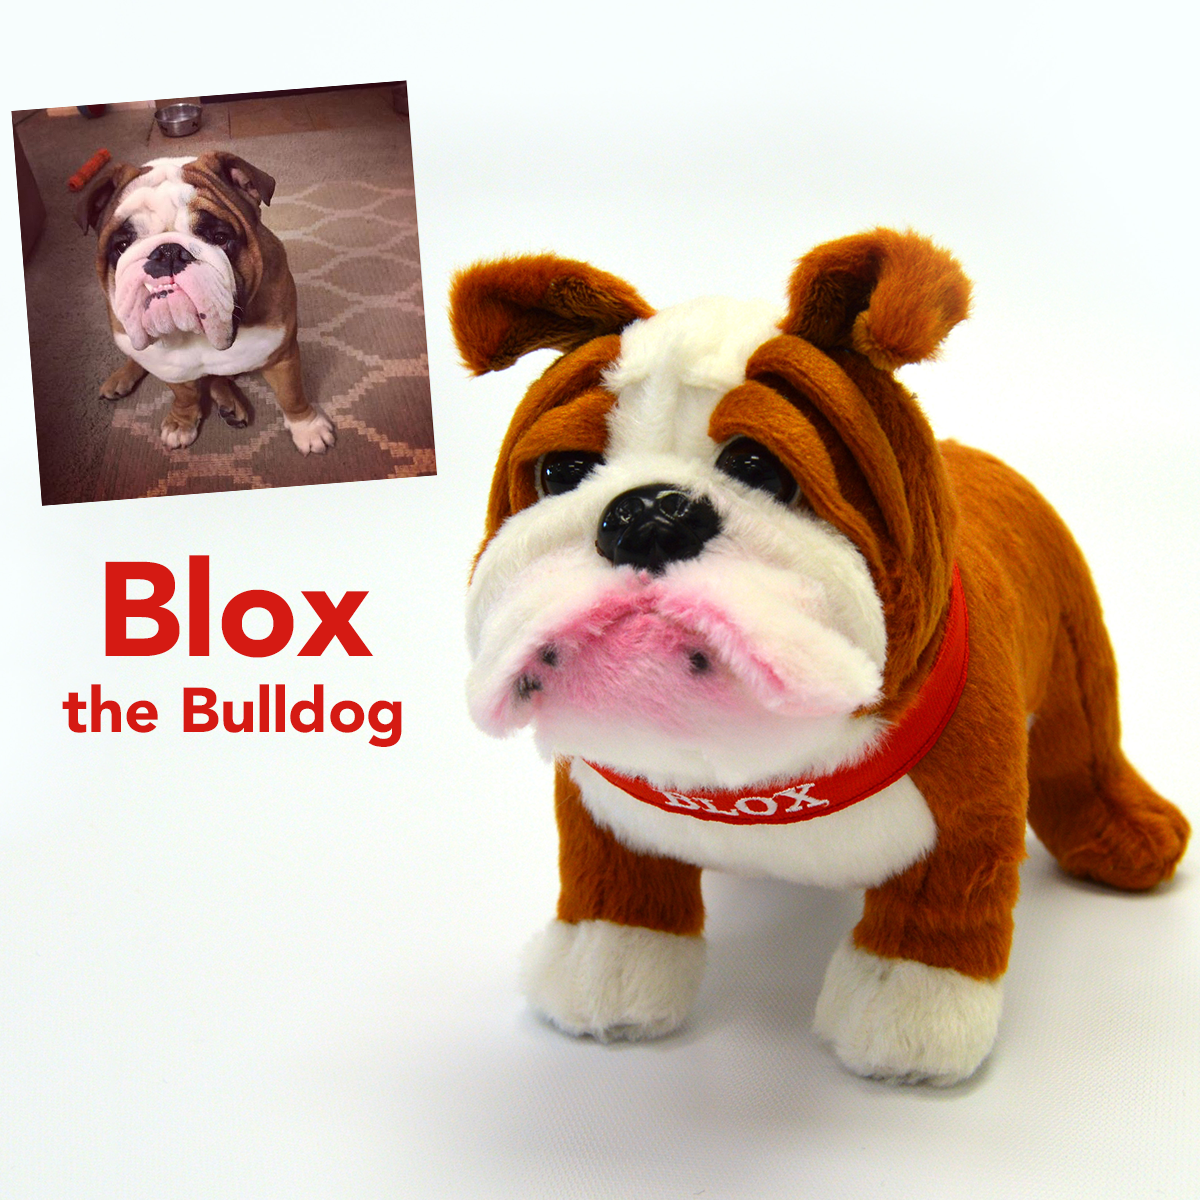 blox the bulldog stuffed animal -